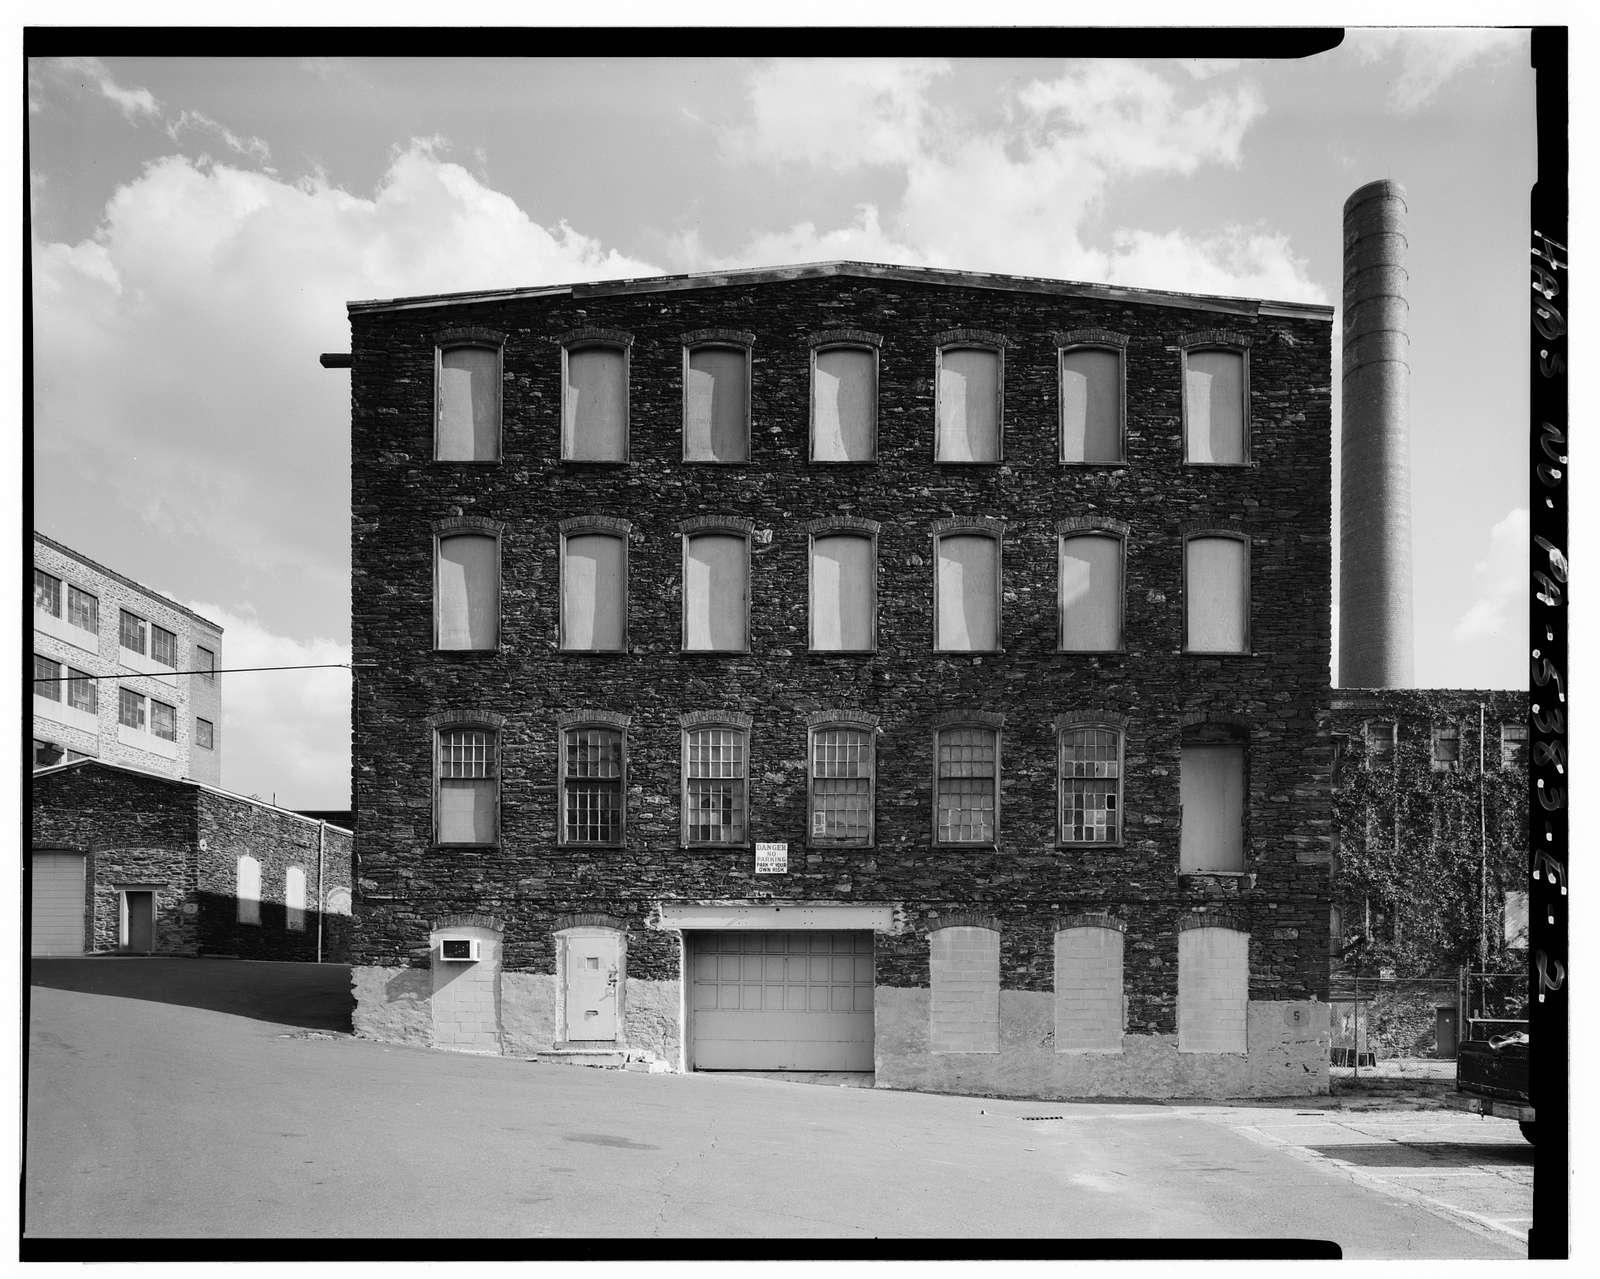 John & James Dobson Carpet Mill (West Parcel), Building No. 5, 4041-4055 Ridge Avenue, Philadelphia, Philadelphia County, PA